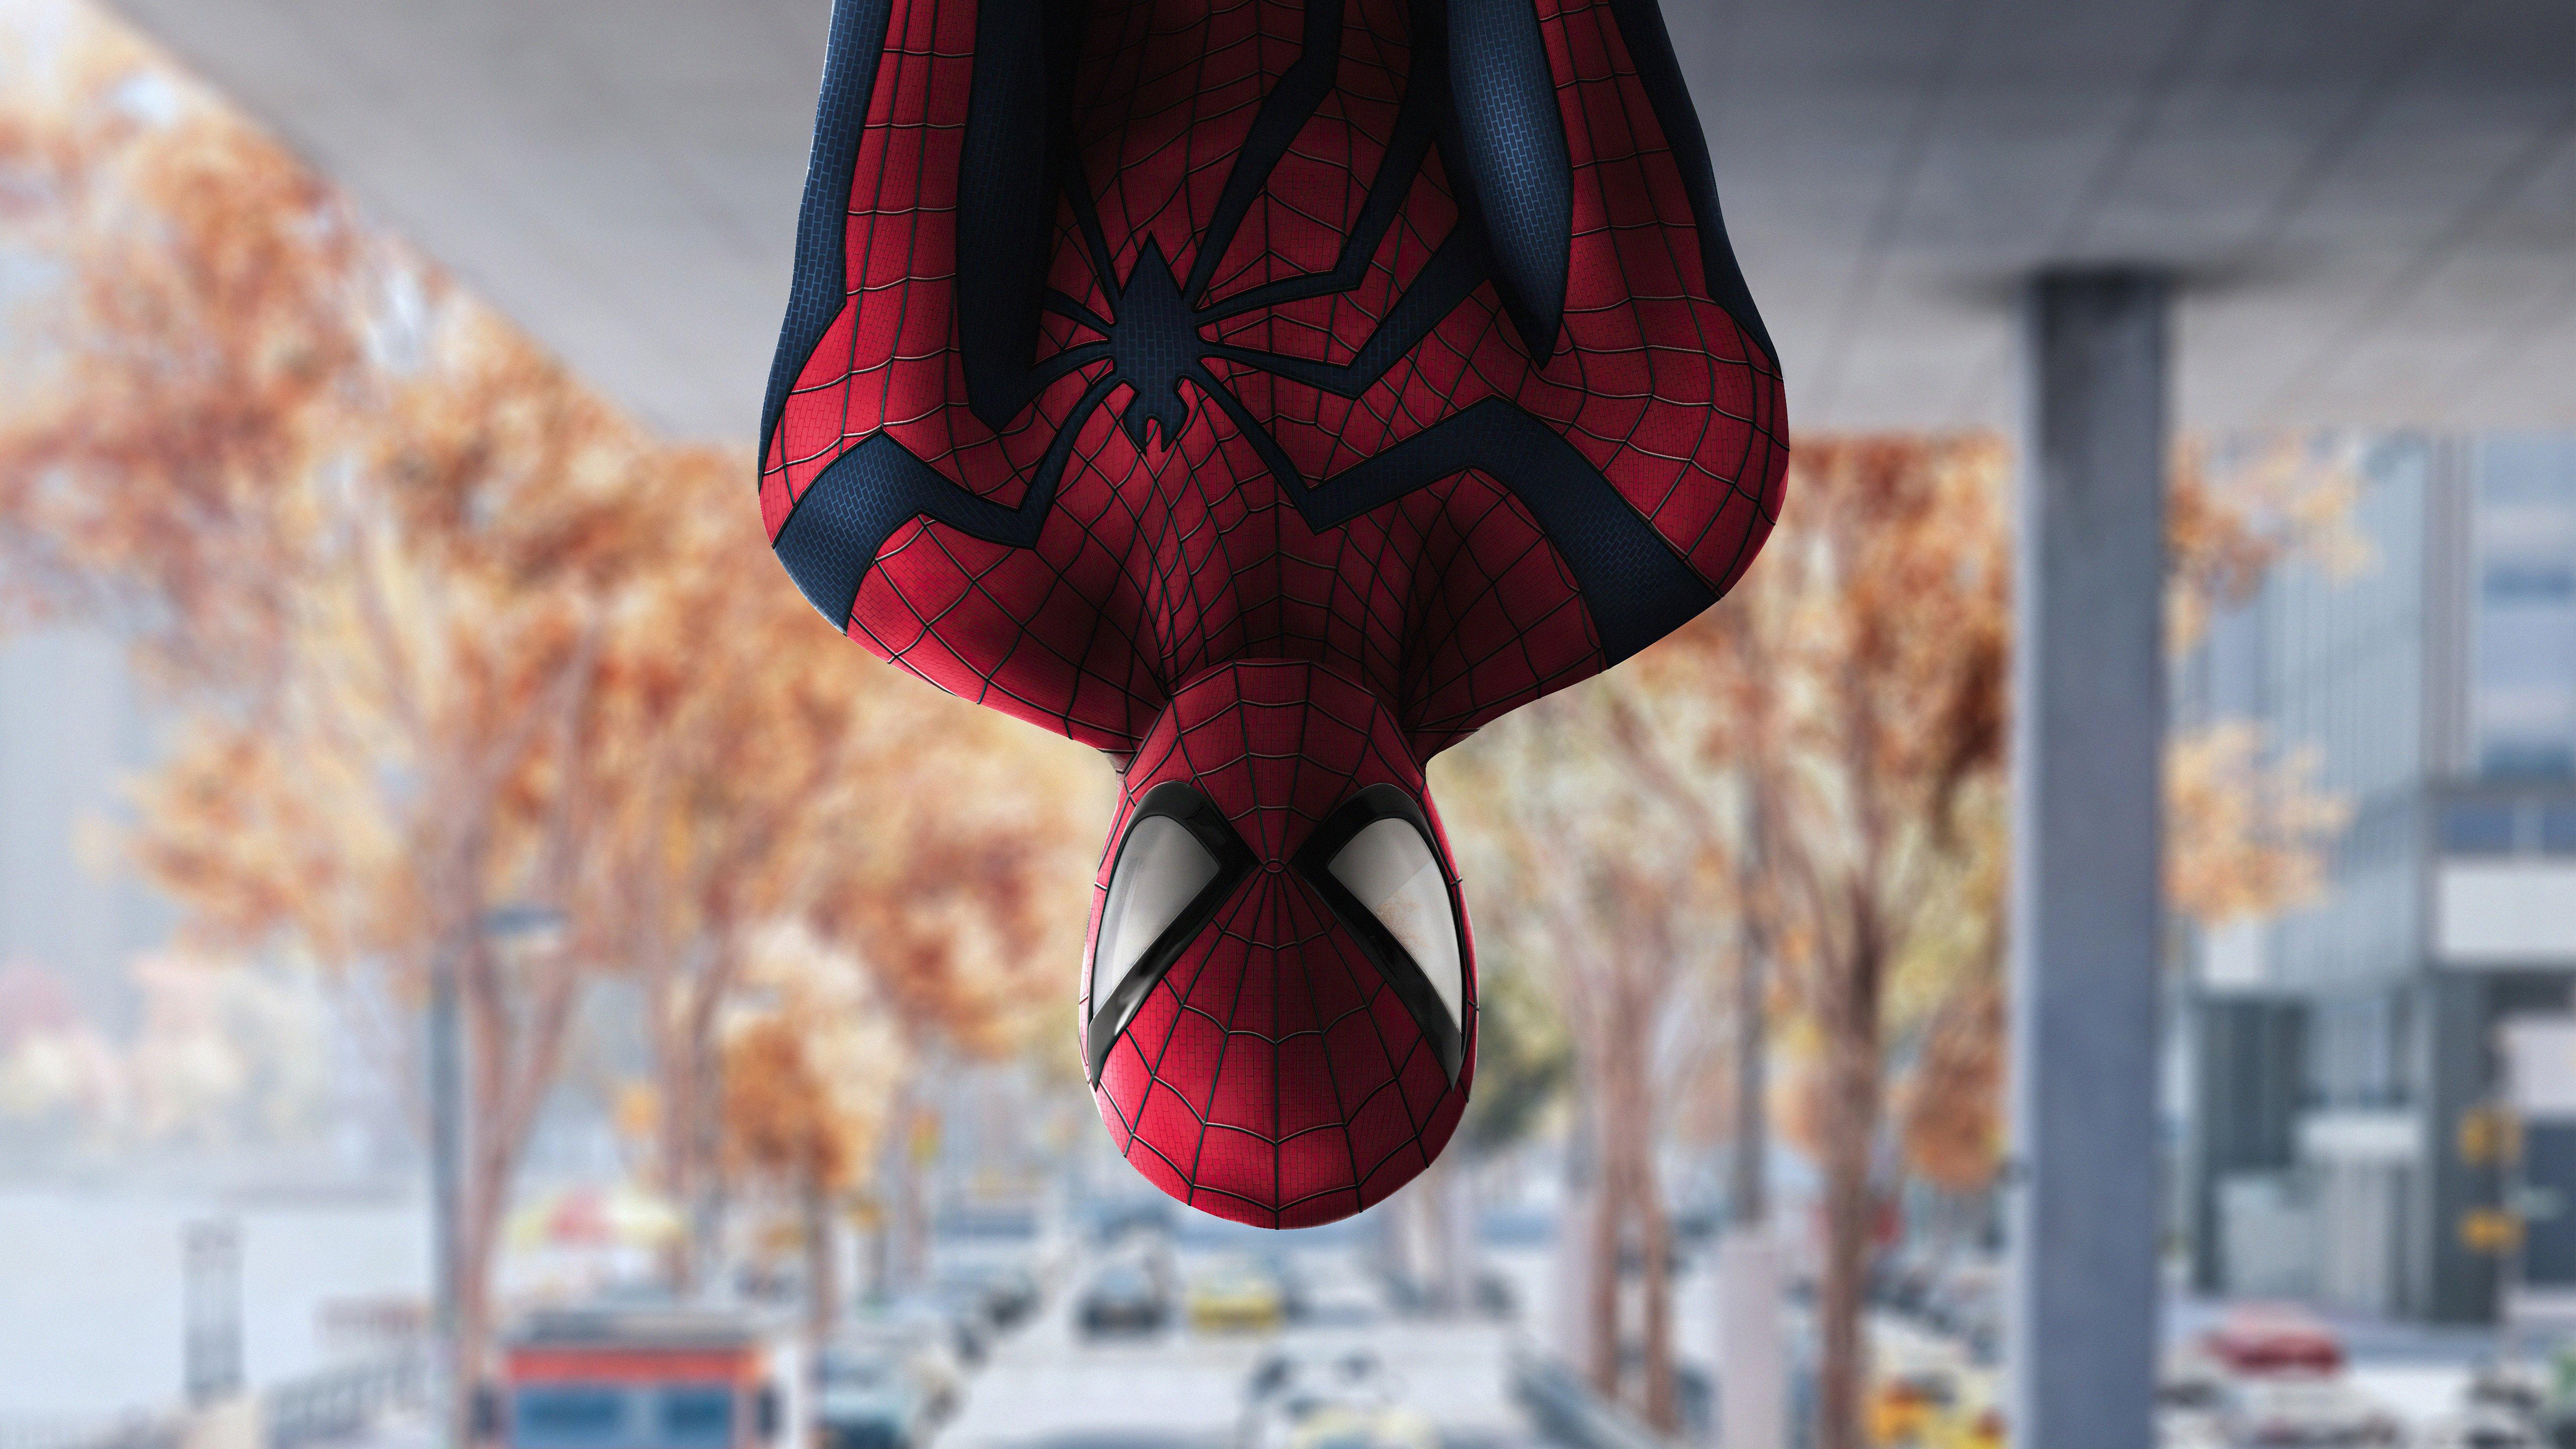 Wallpaper Spider Man Beyond